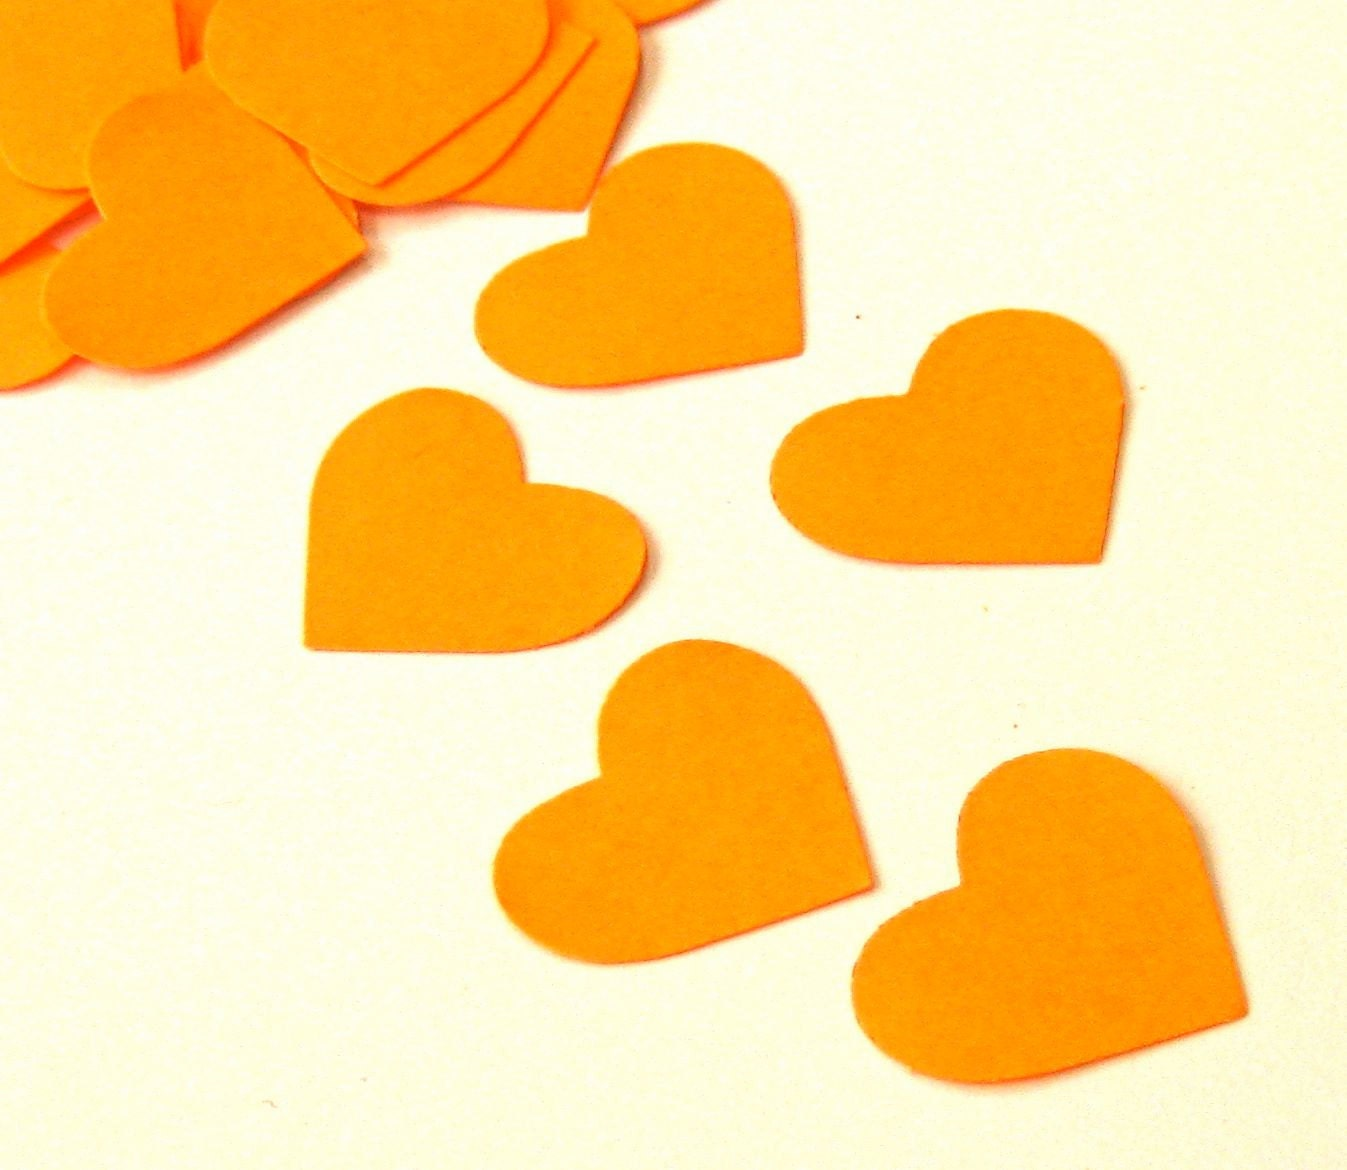 Neon Hearts Pictures Neon Orange Love Hearts